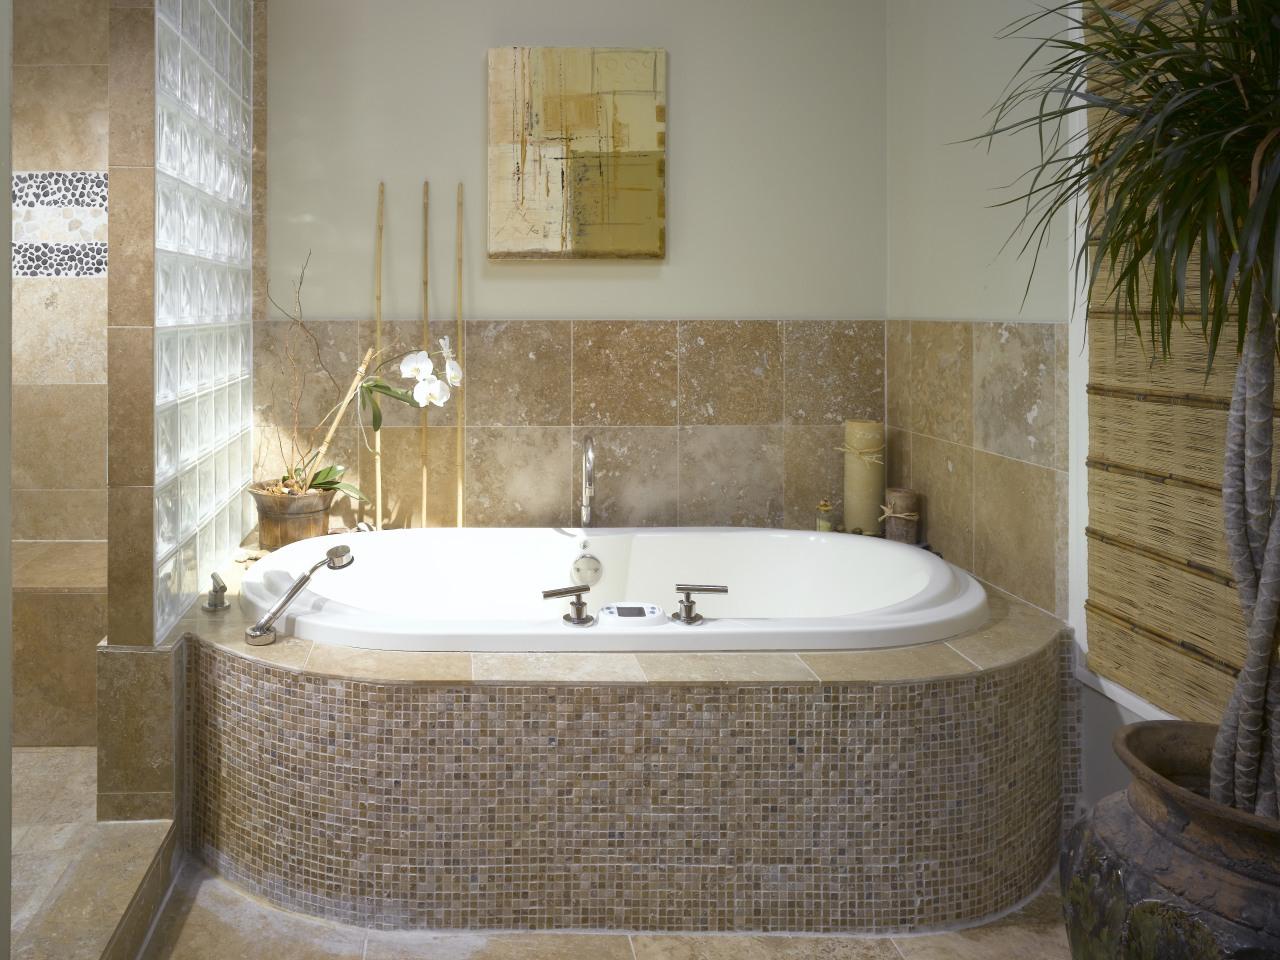 Small travertine tiles on the front of the bathroom, bathtub, floor, flooring, interior design, plumbing fixture, room, tile, wall, brown, gray